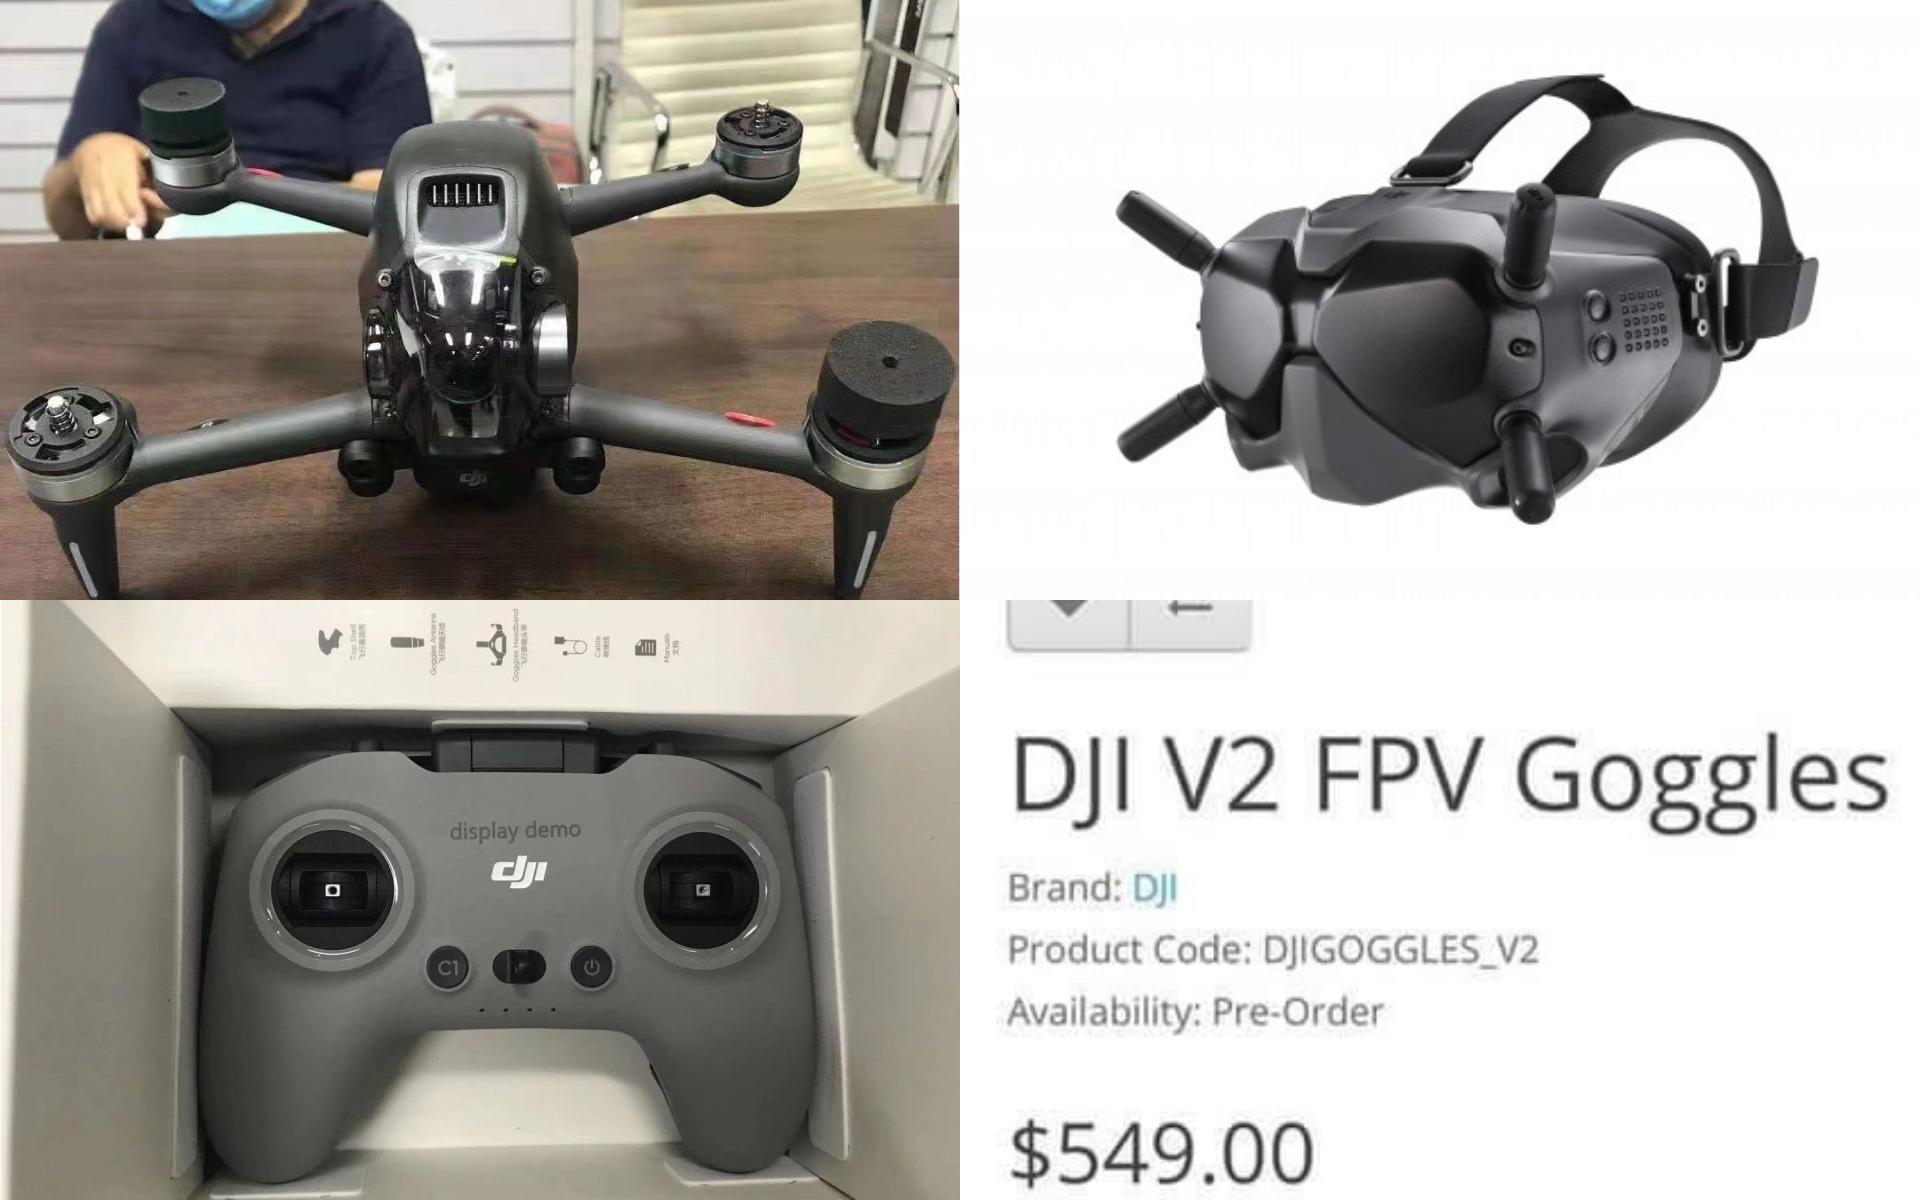 DJI FPV Goggles V2 售價搶先曝光? 更多穿越機諜照曝光